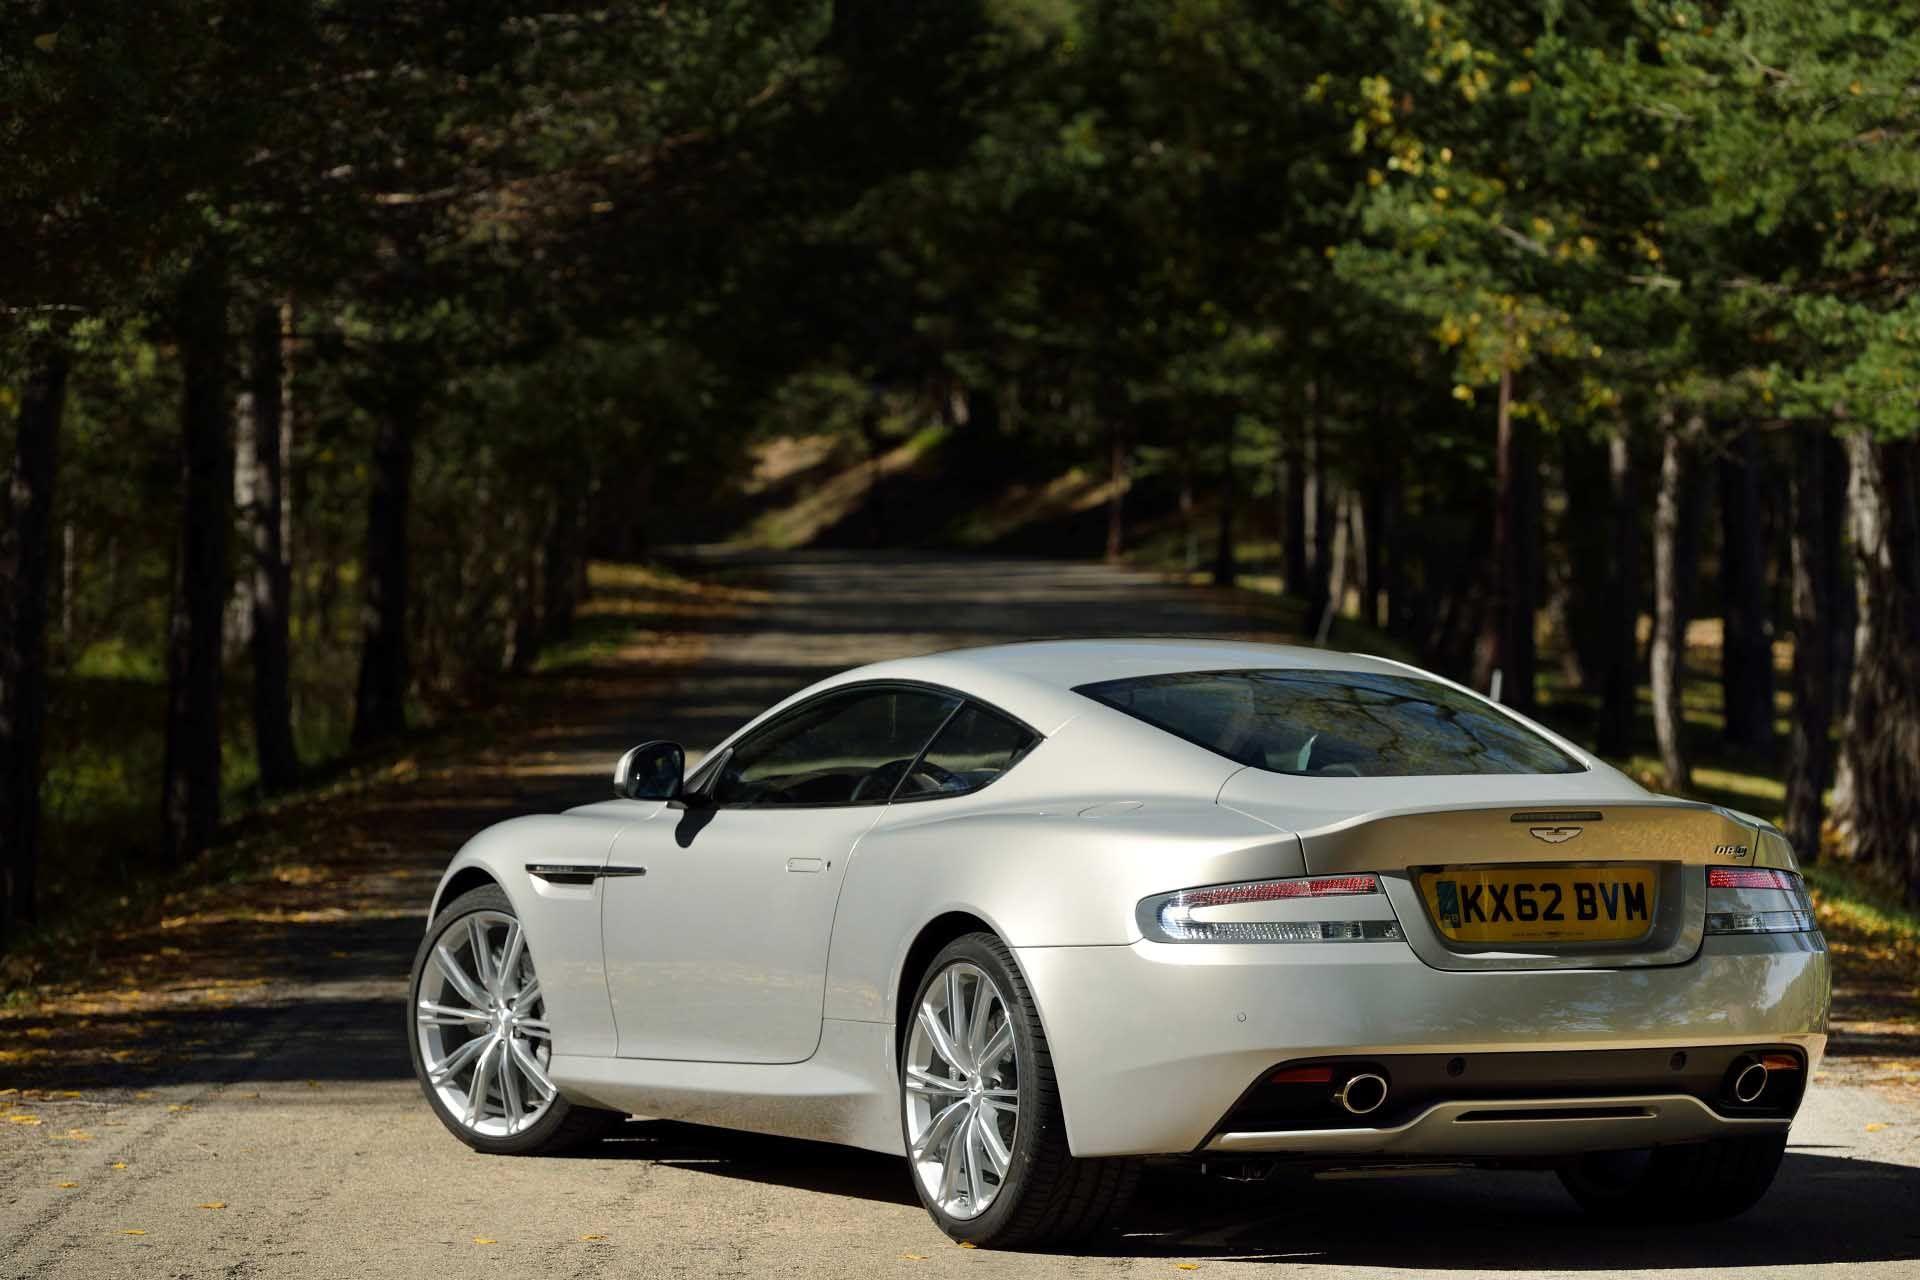 10 Aston Martin Db9 Silver Blonde Features Rear Three Quarter Images Aston Martin Aston Silver Blonde